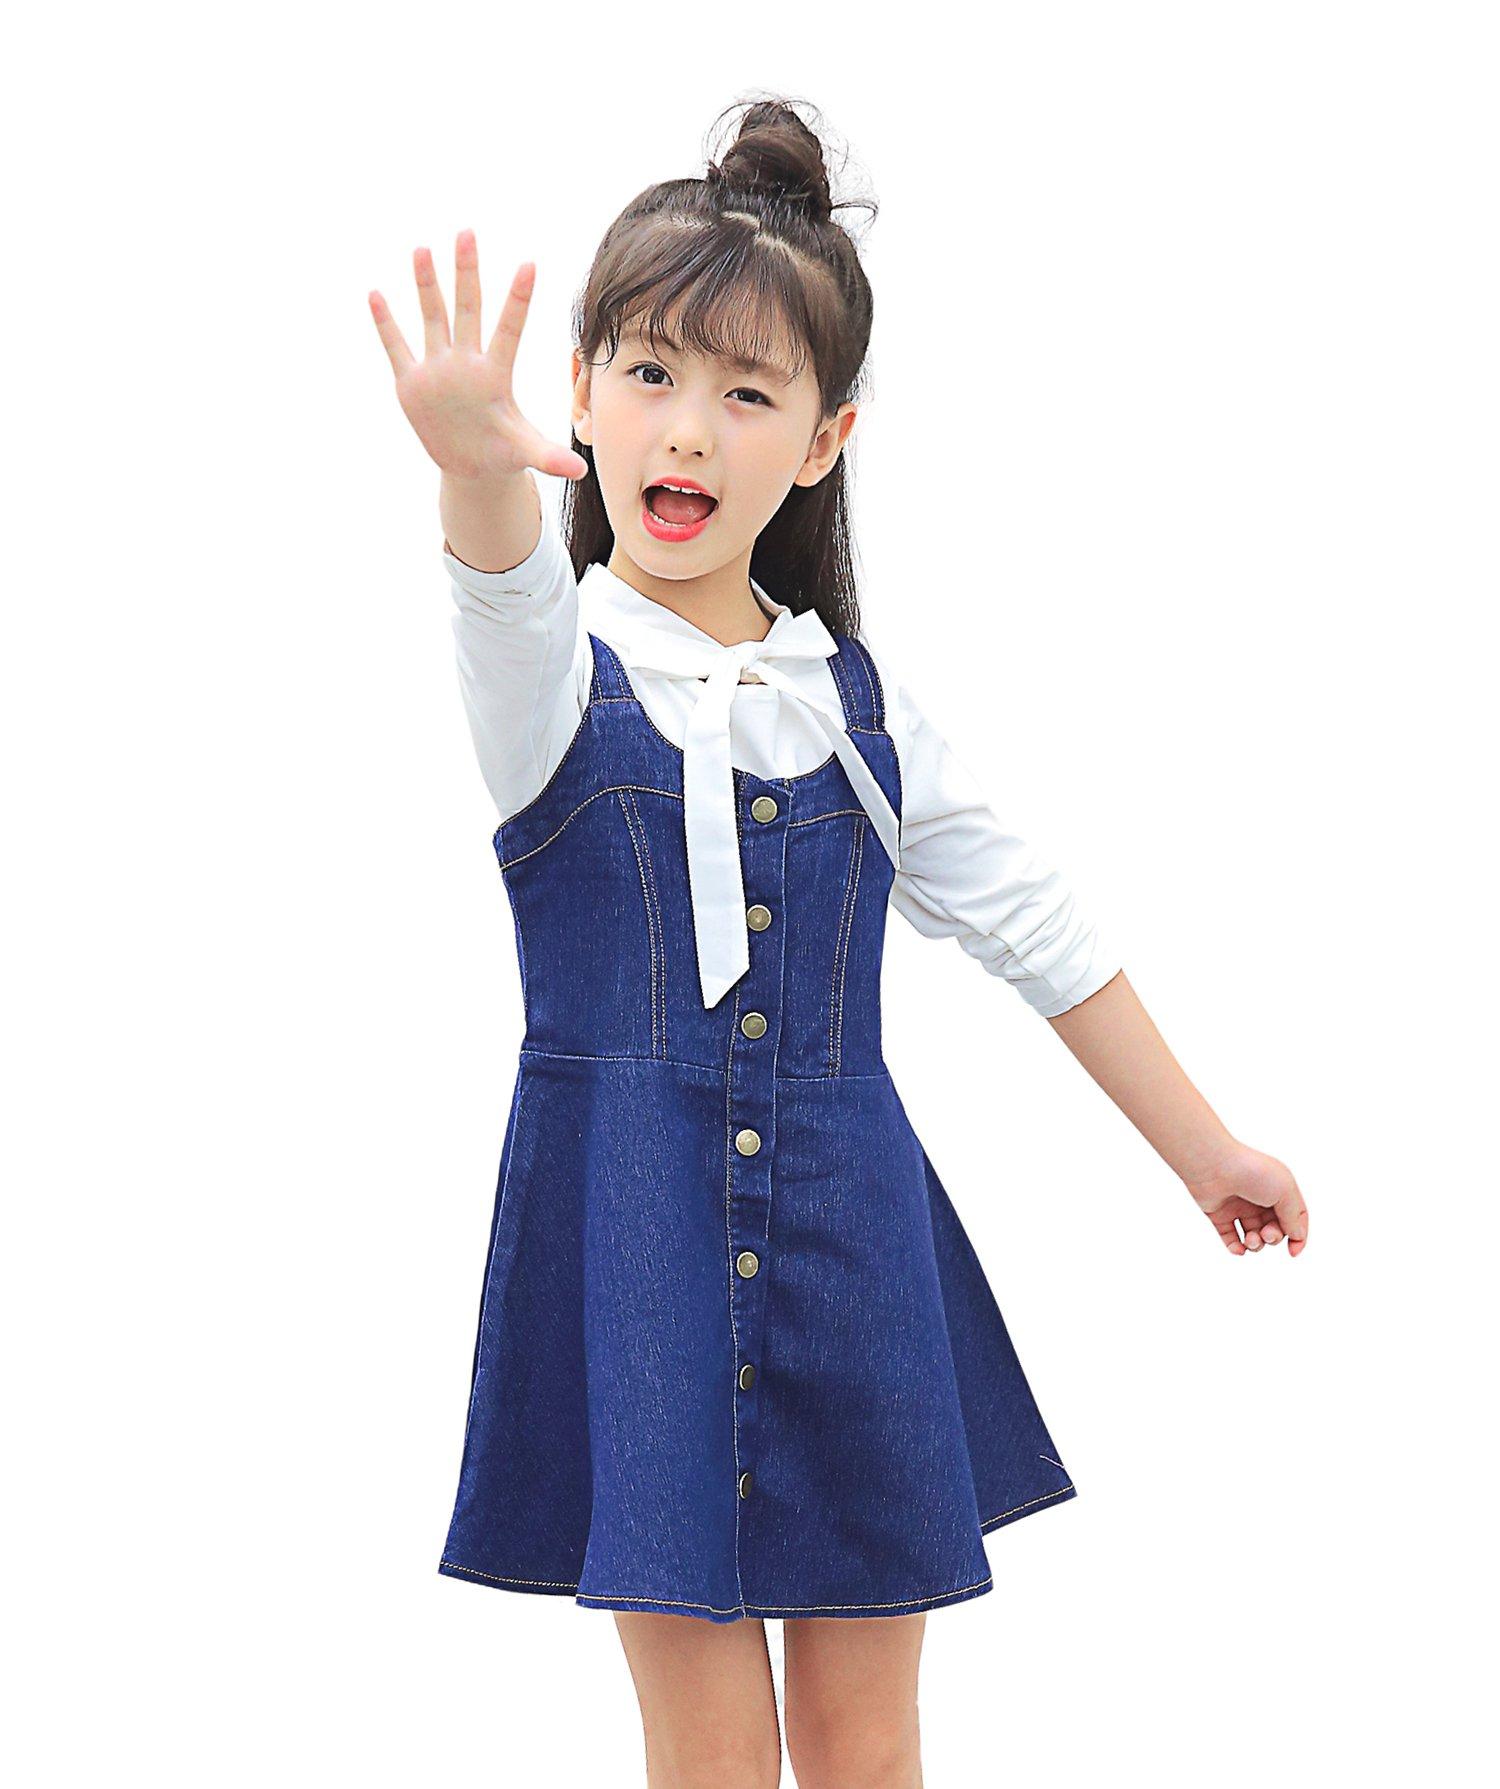 Kidscool Girls Cute Cardigan Jeans Summer Overalls Dress,Blue,4-5 Years